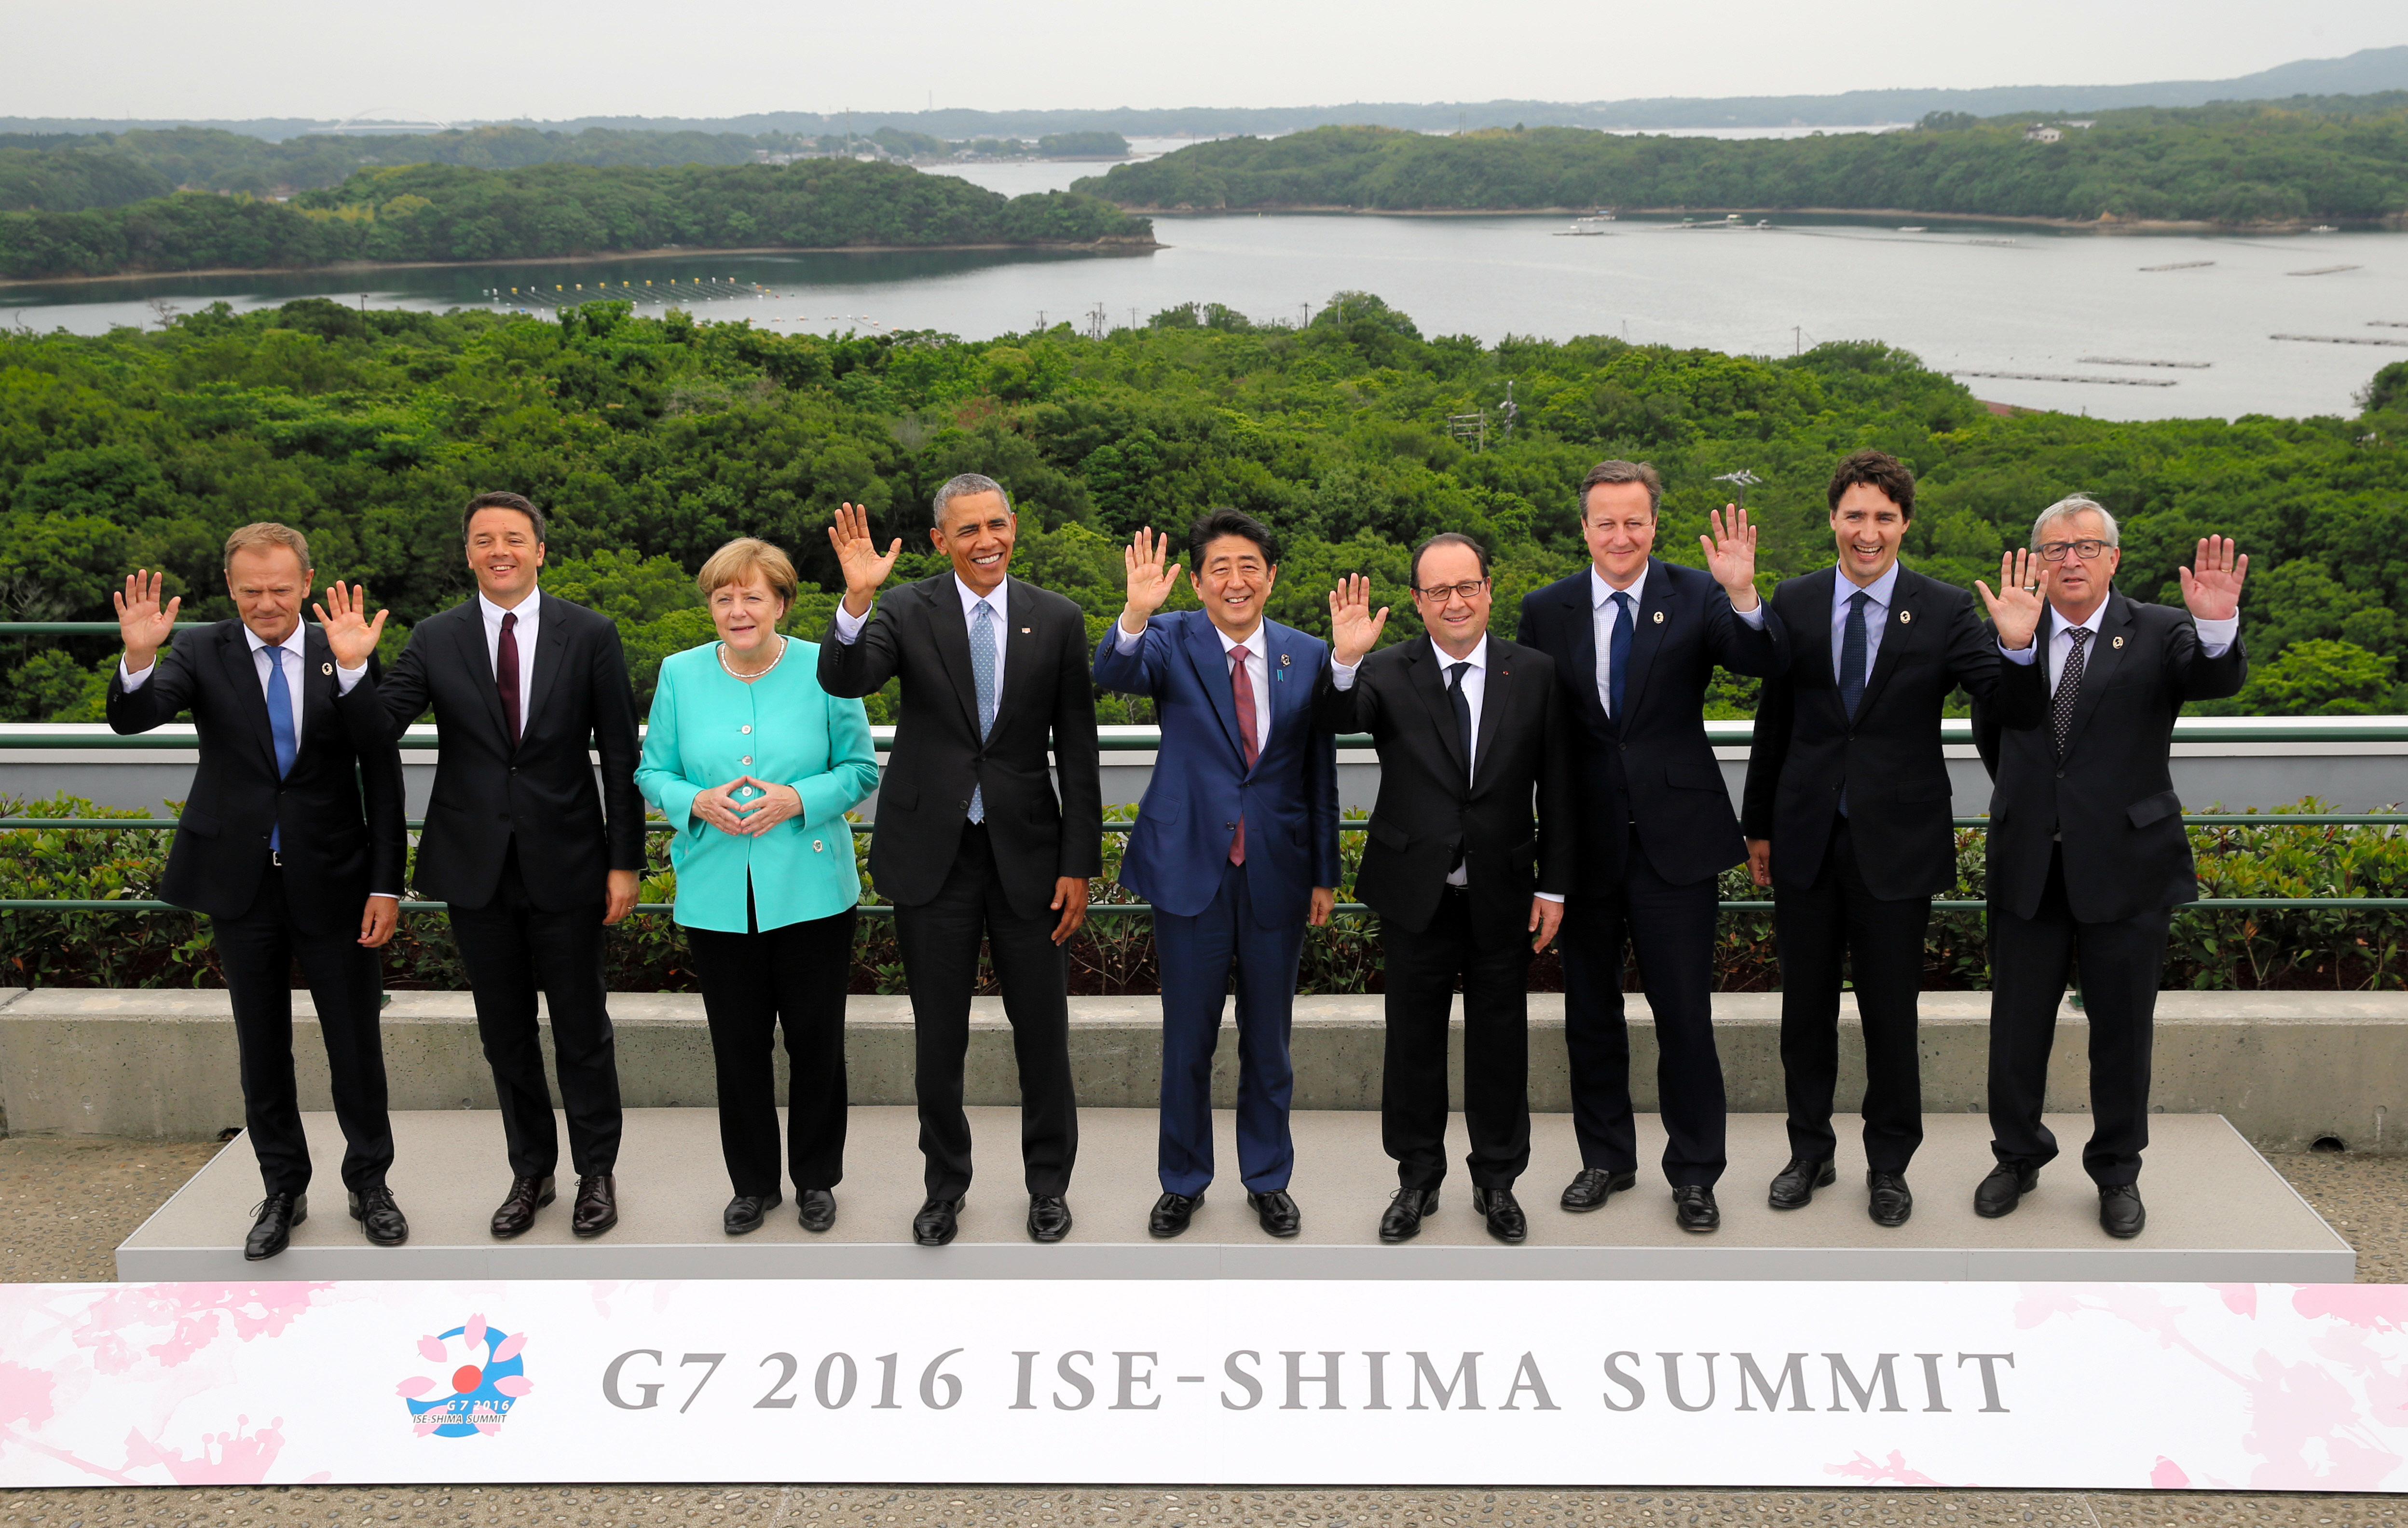 ¿Cuánto mide Angela Merkel? - Altura - Real height Mujeresg72